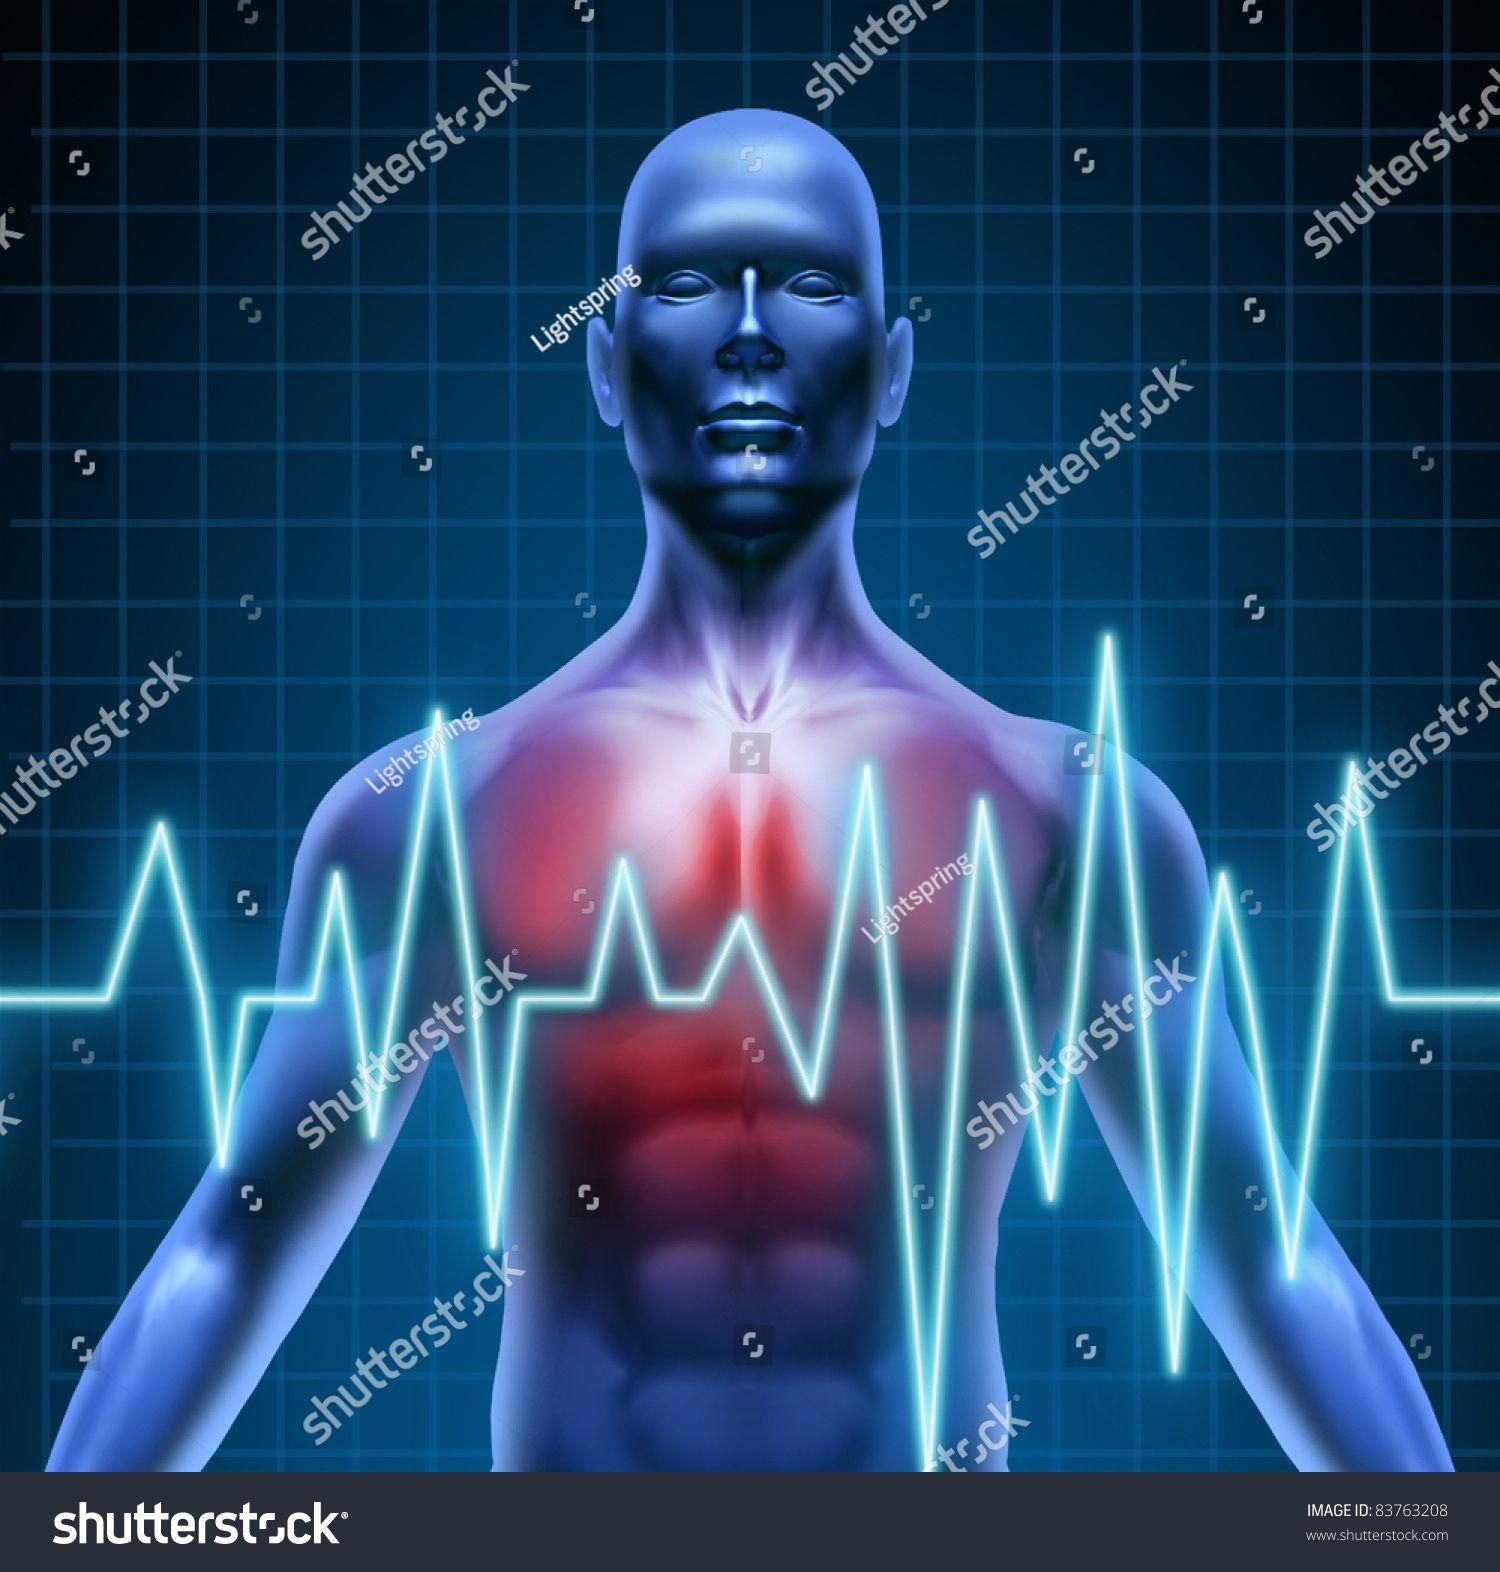 Heart and coronary disease representing the medical